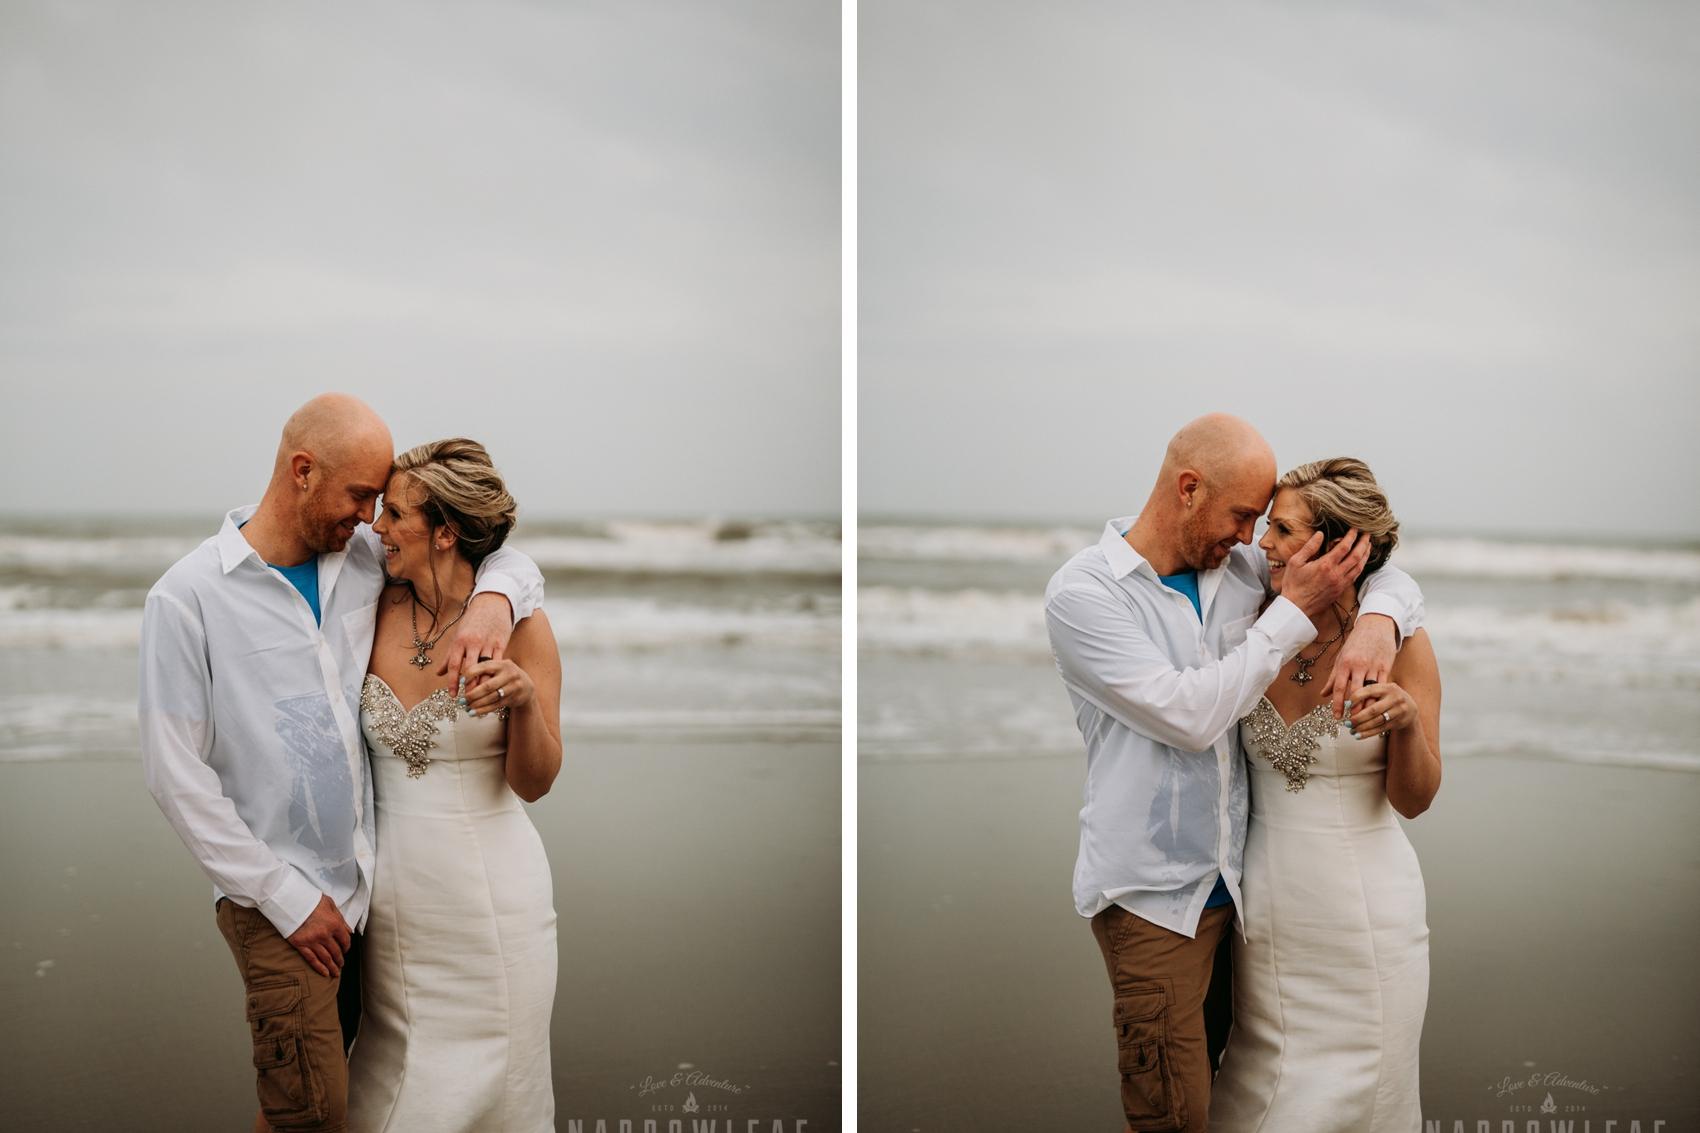 south-carolina-folly-beach-moody-destination-bride-groom-photos-031-032.jpg